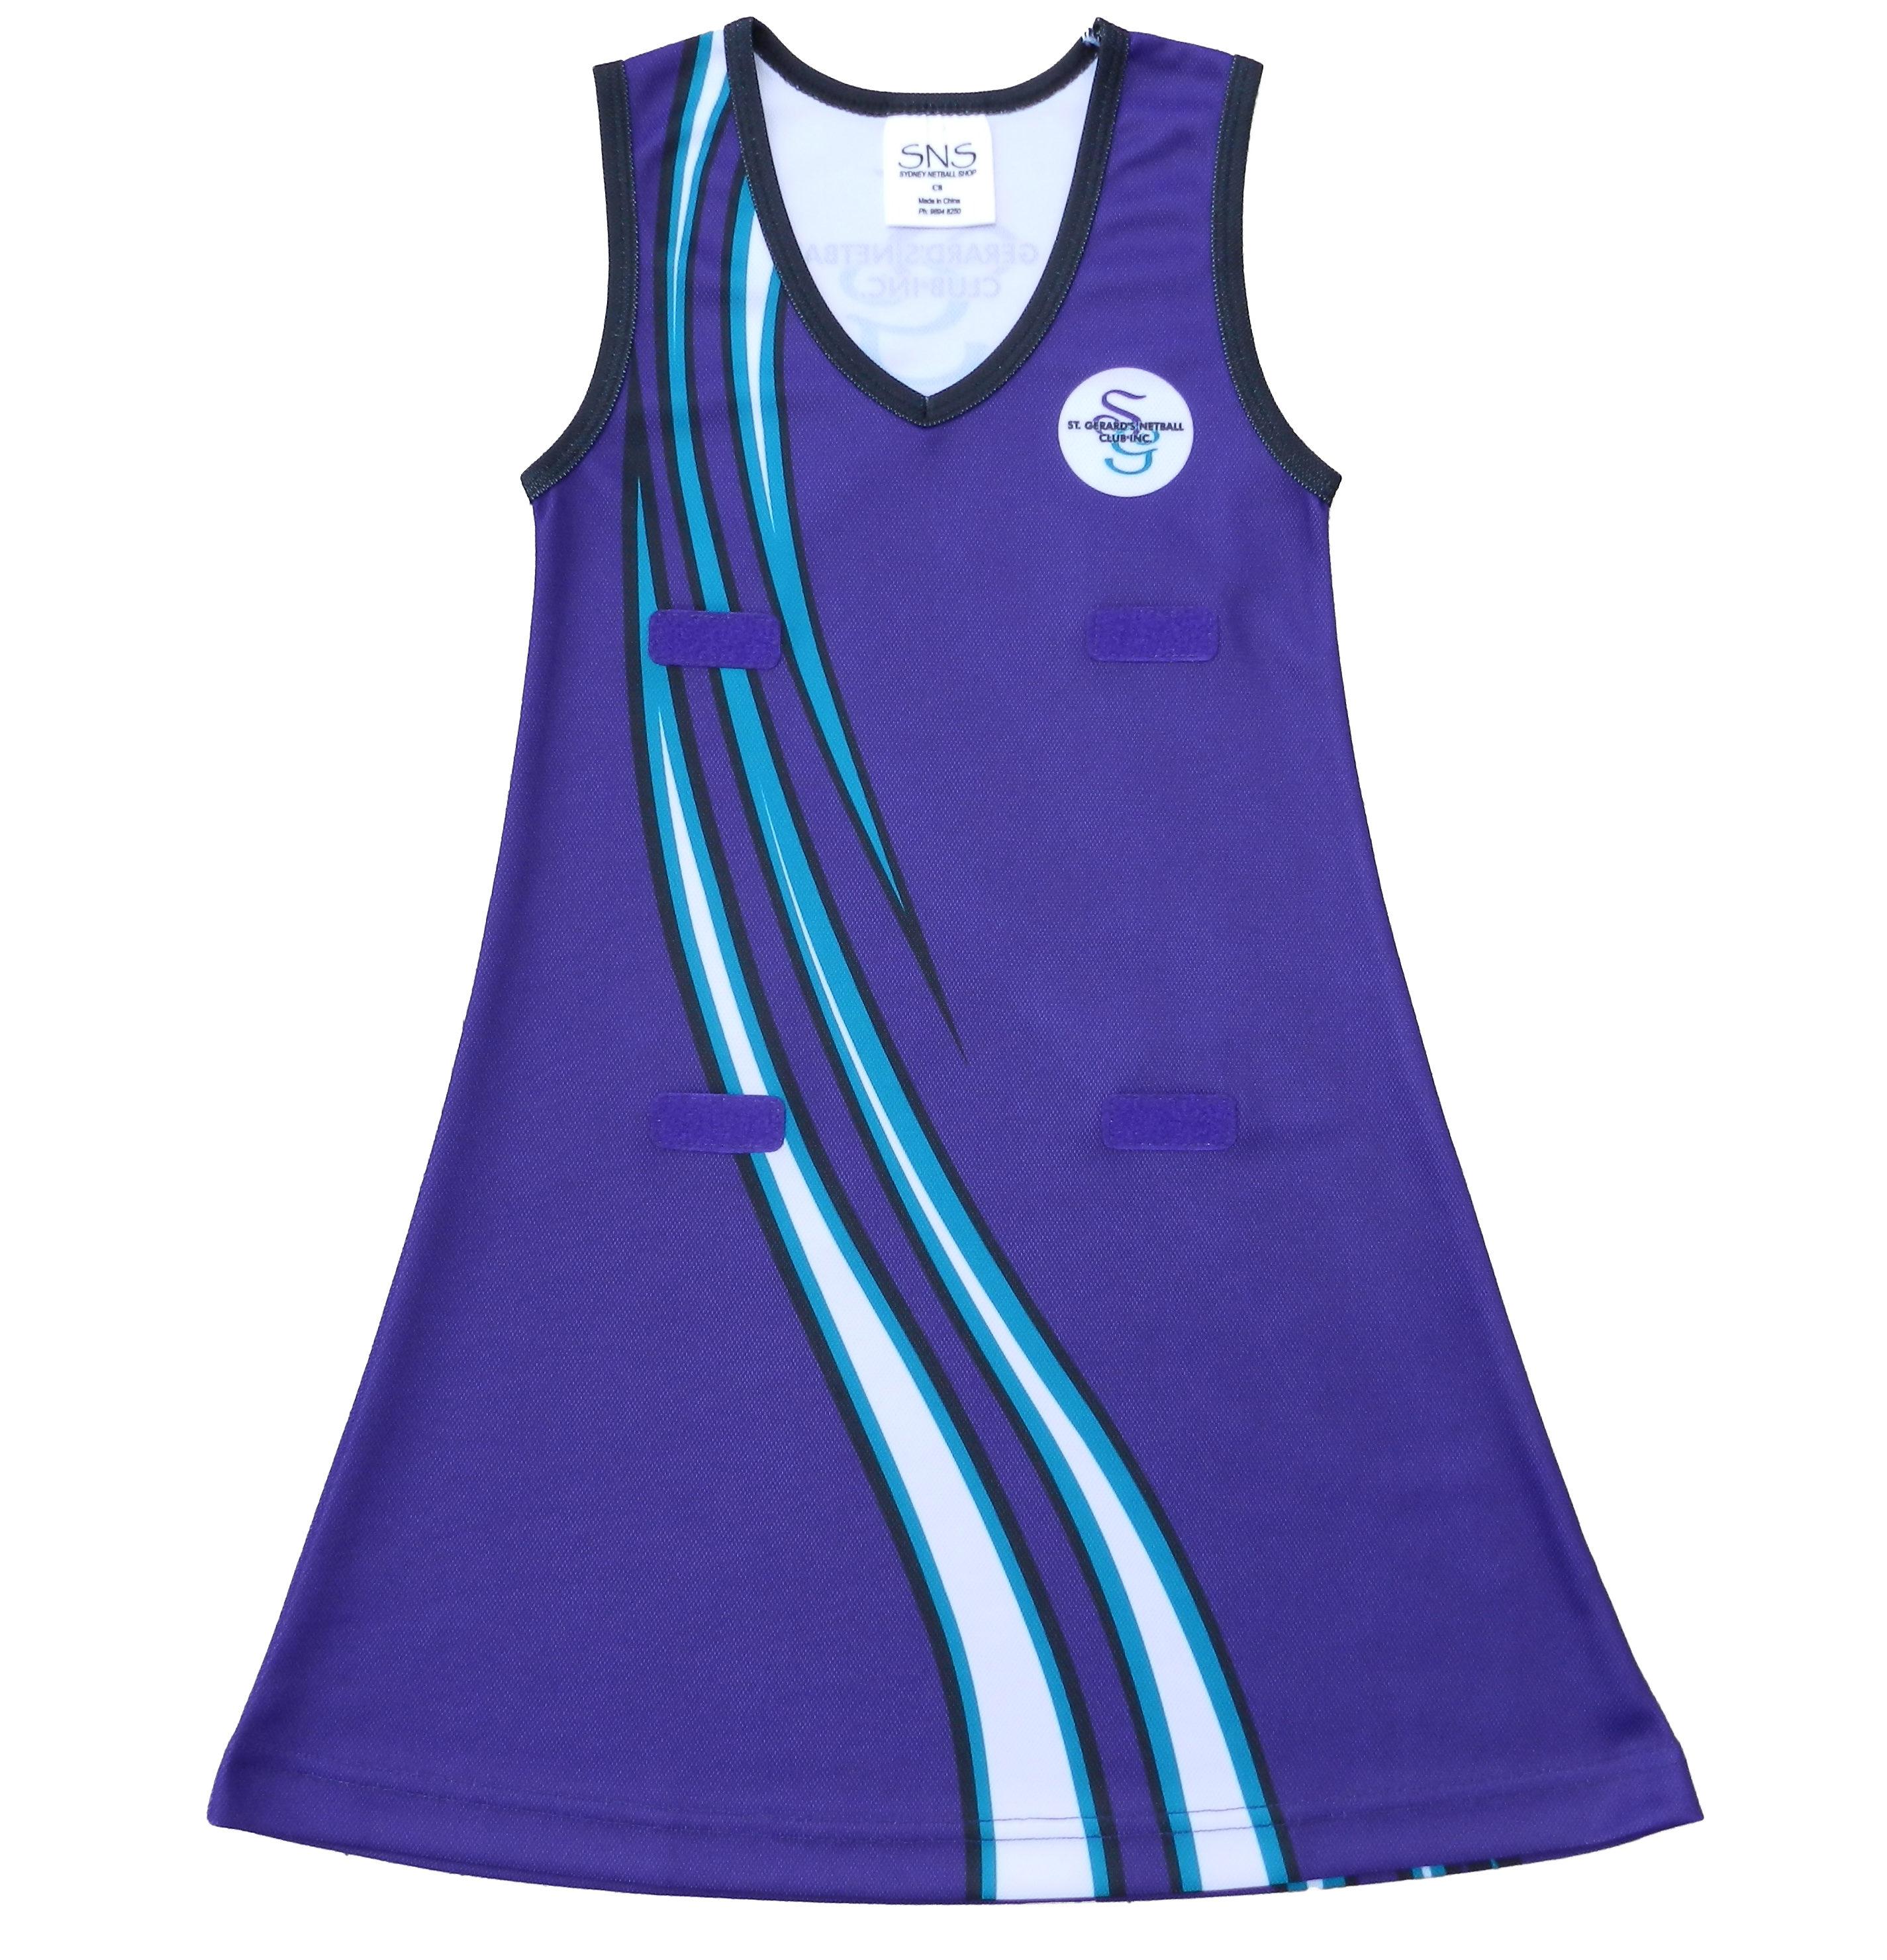 8d59d1ffadb St Gerards Netball Club – Sydney Netball Shop